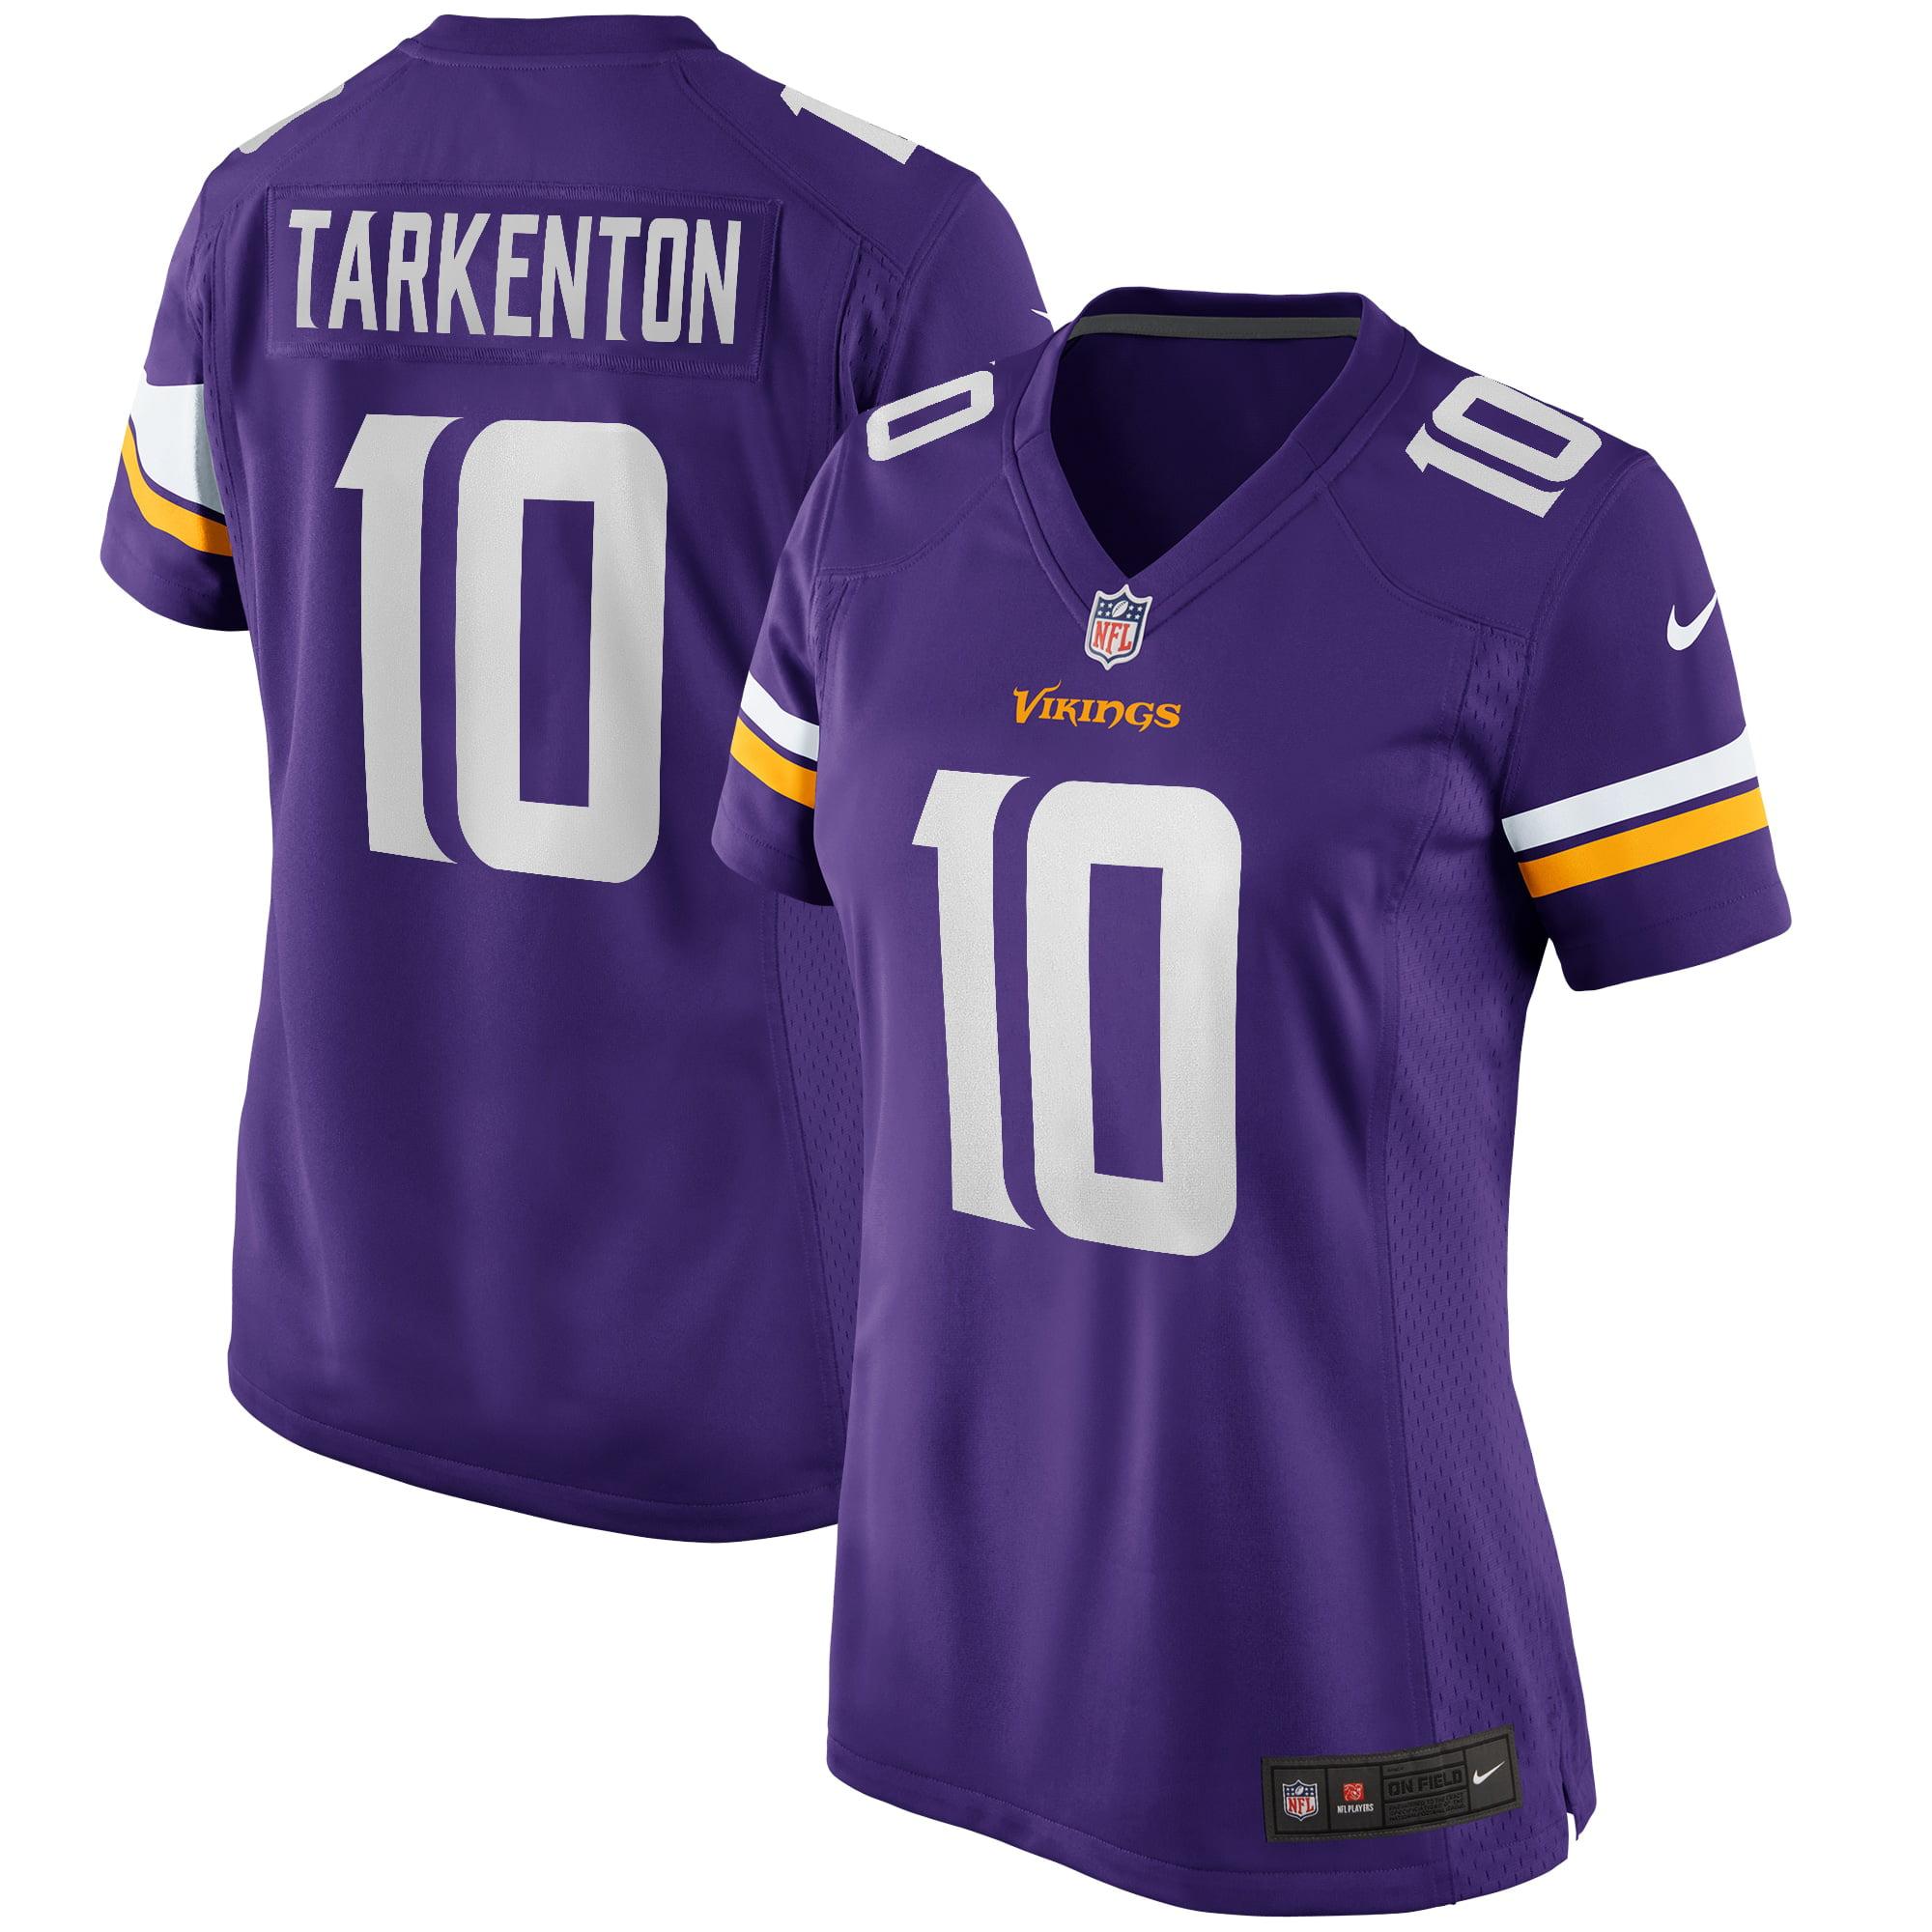 Fran Tarkenton Minnesota Vikings Nike Women's Game Retired Player Jersey - Purple - Walmart.com